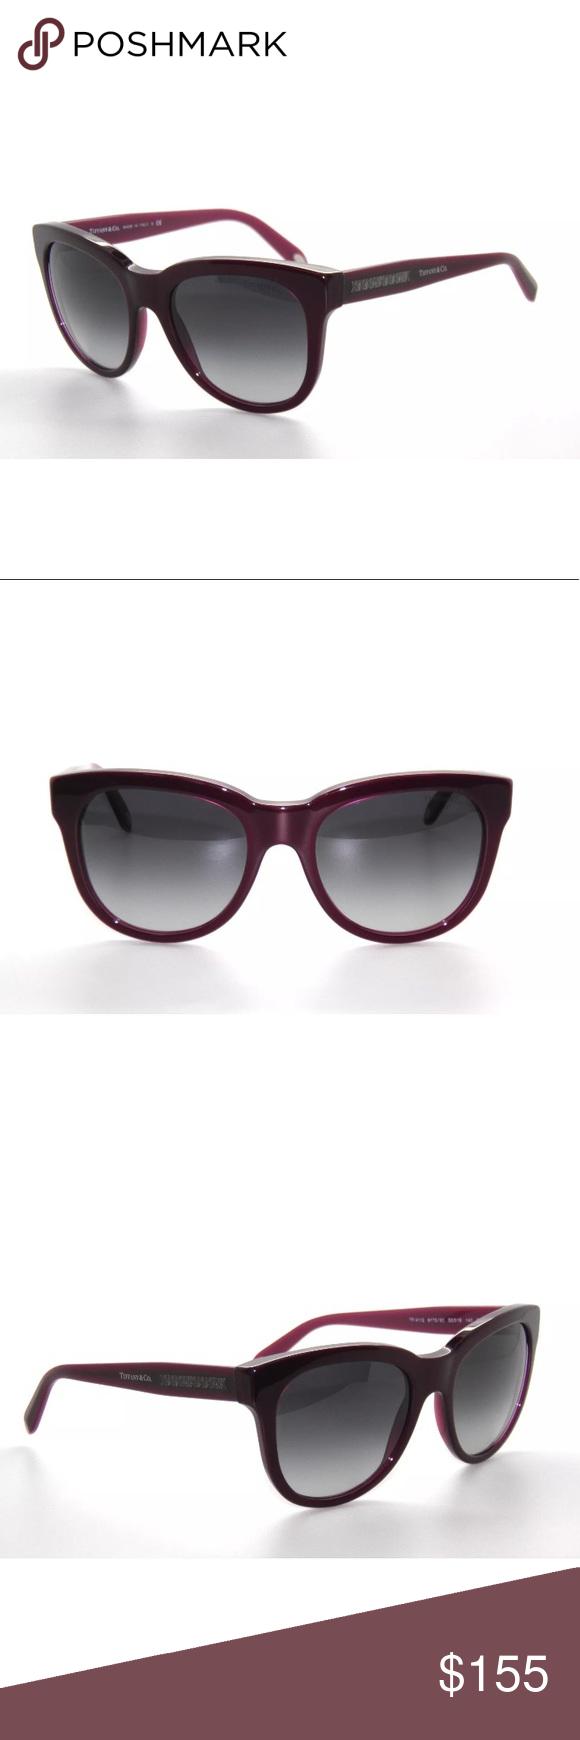 525ae76bba33 Authentic Tiffany Plum Sunglasses 4112 New Comes with Tiffany case. Authentic  Tiffany   Co. Accessories Sunglasses